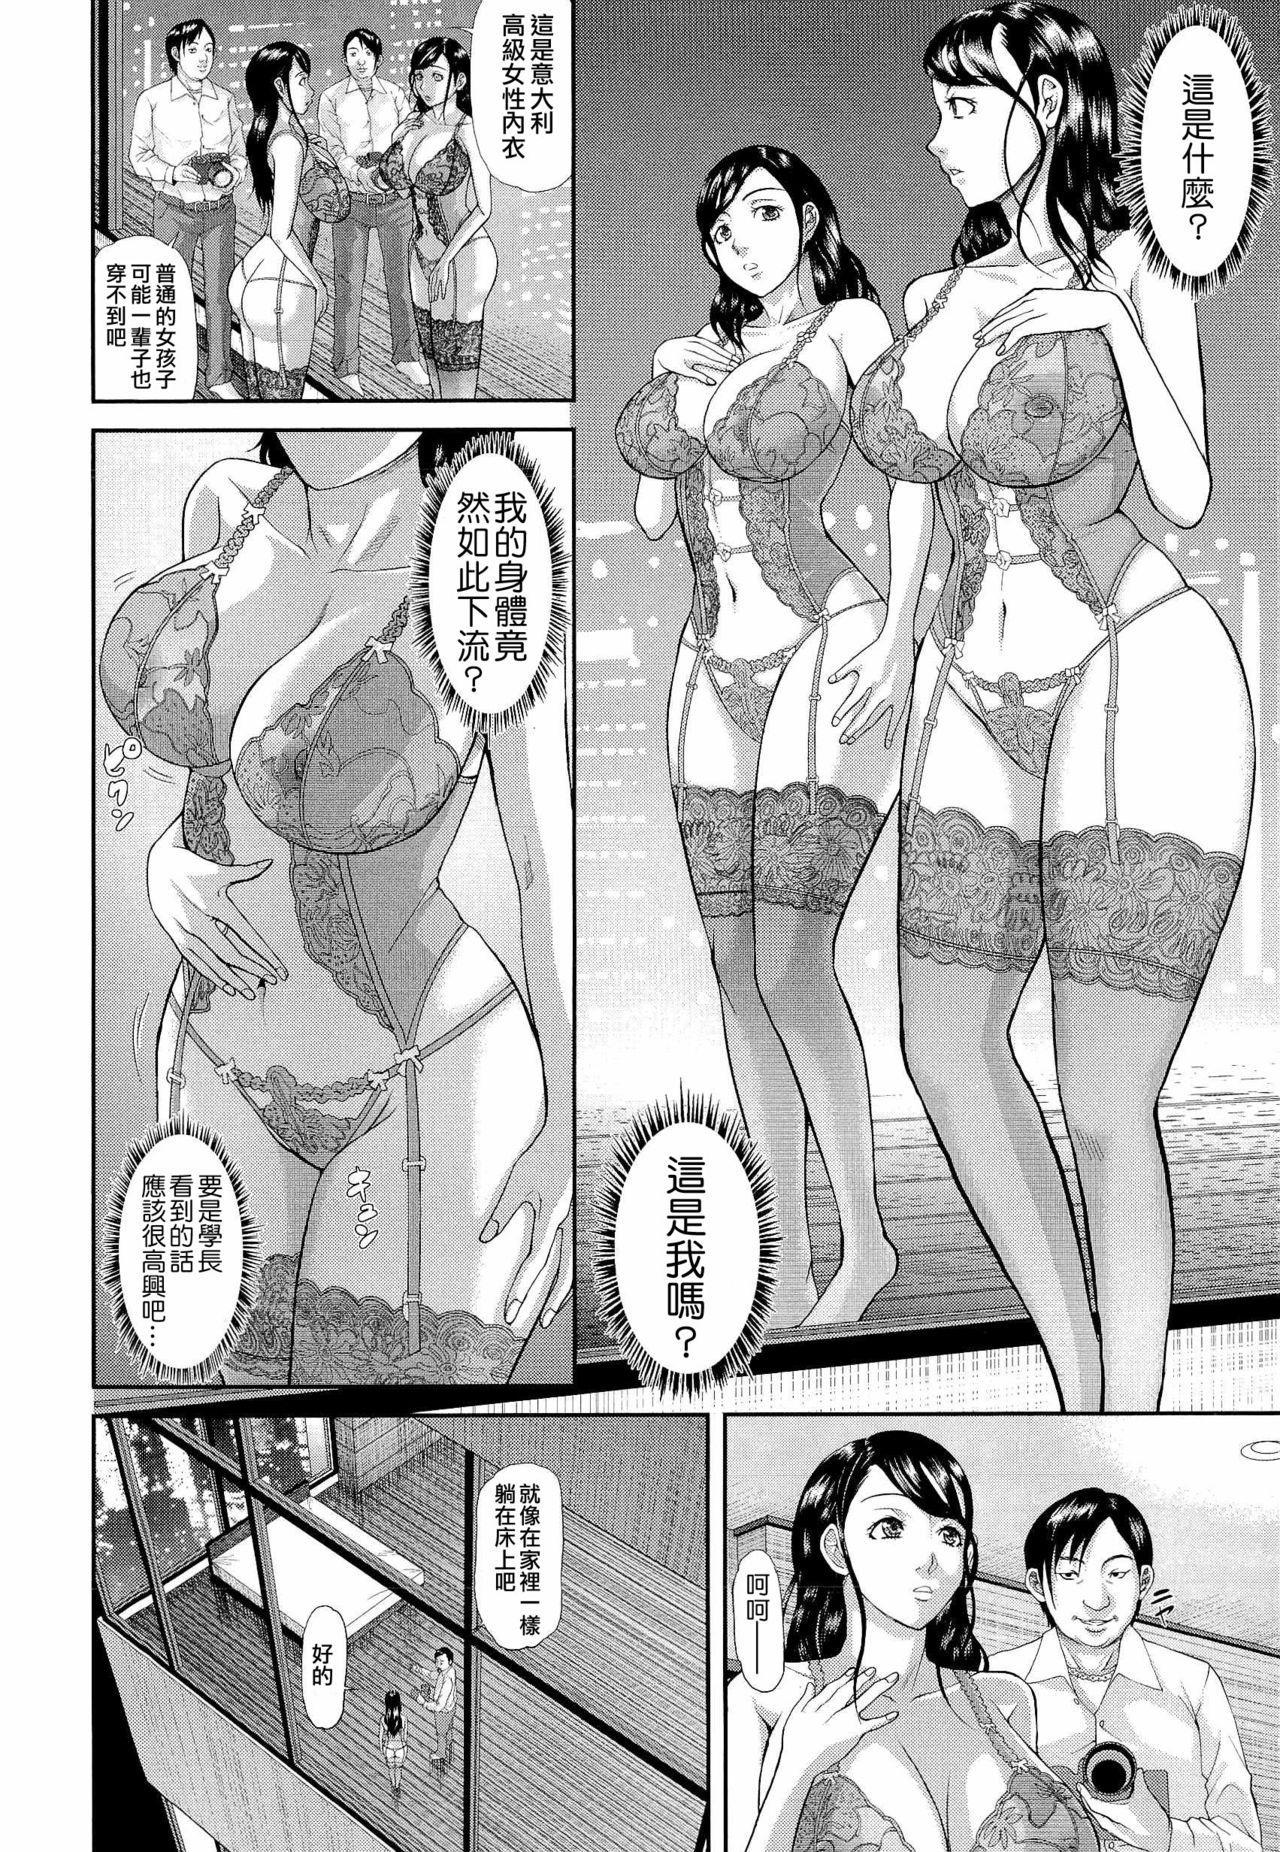 [Honebuto Danshaku] Innou Kaizou Program ~Oyako Zecchou Cult Ochi~ [Chinese]【不想记名重嵌--高质量图源】 110